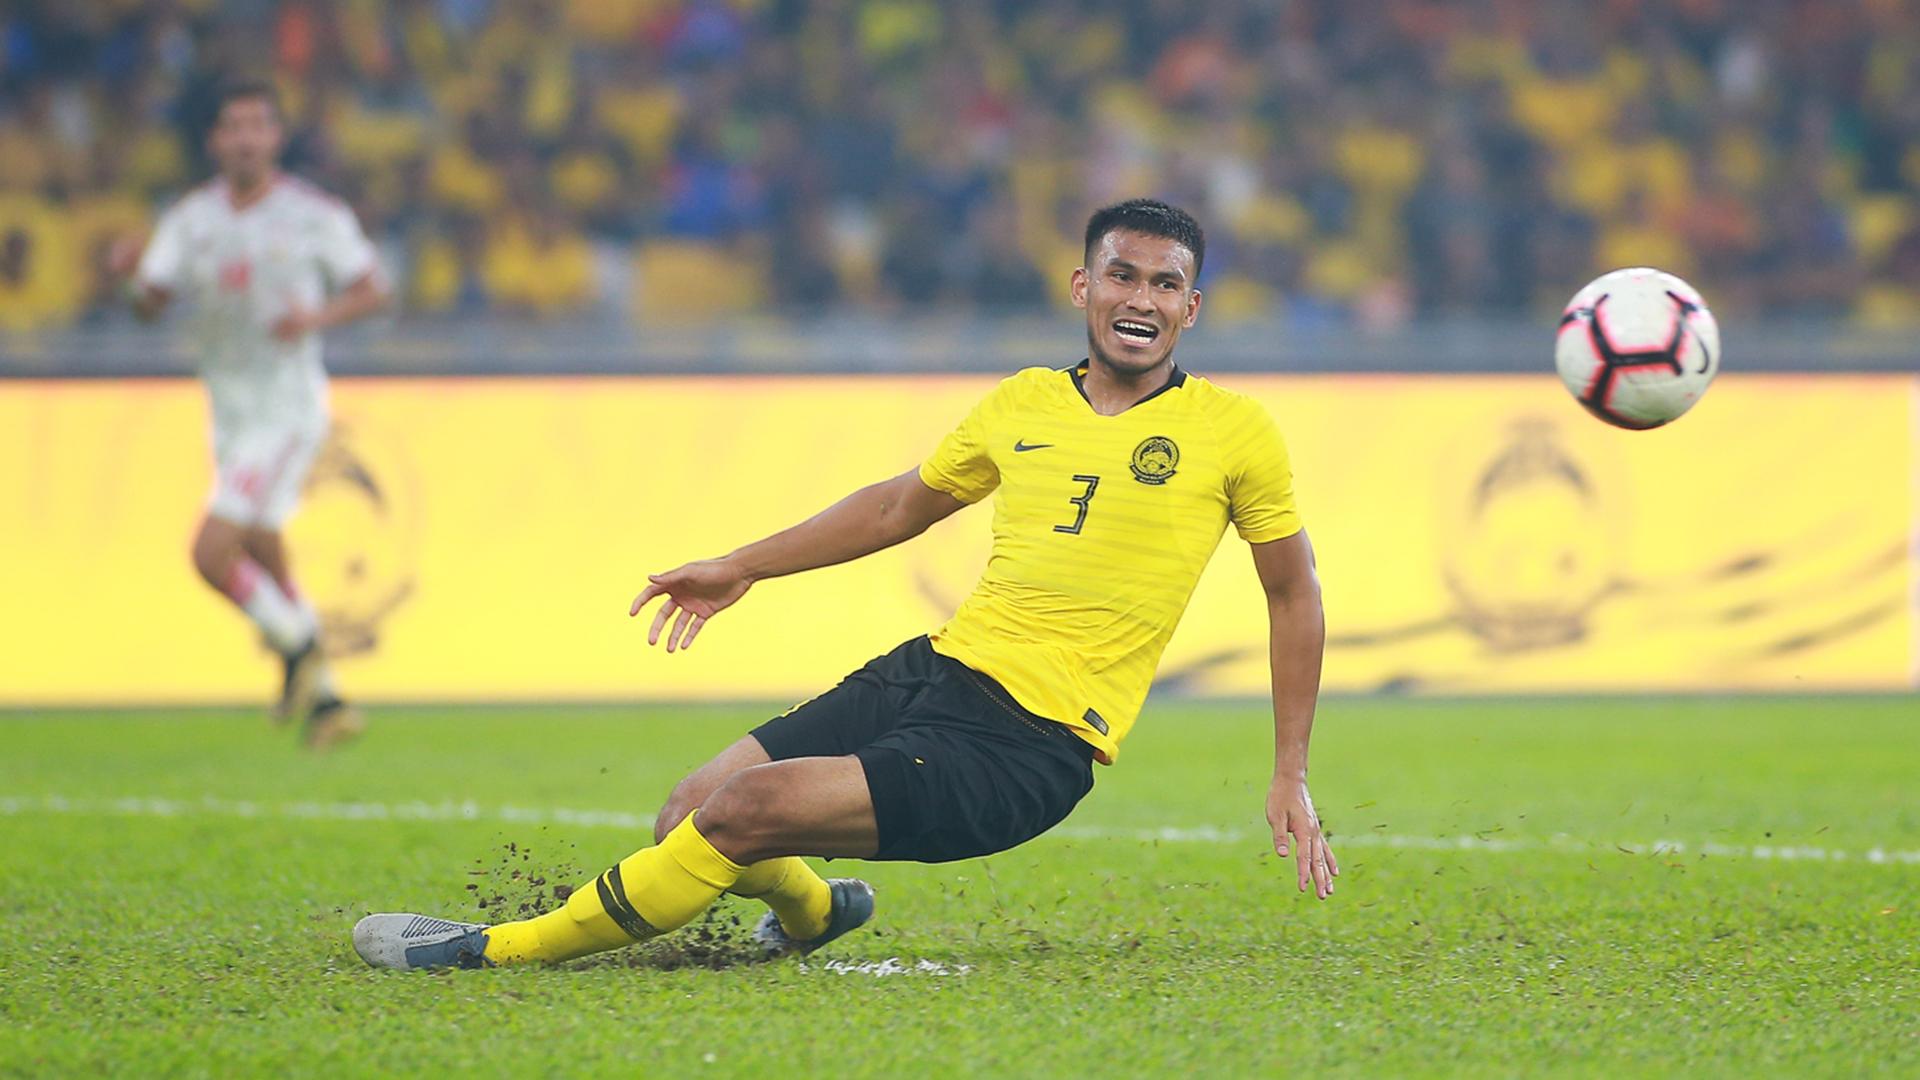 Shahrul Saad, Malaysia v UAE, 2022 World Cup Qualifier, 10 Sep 2019